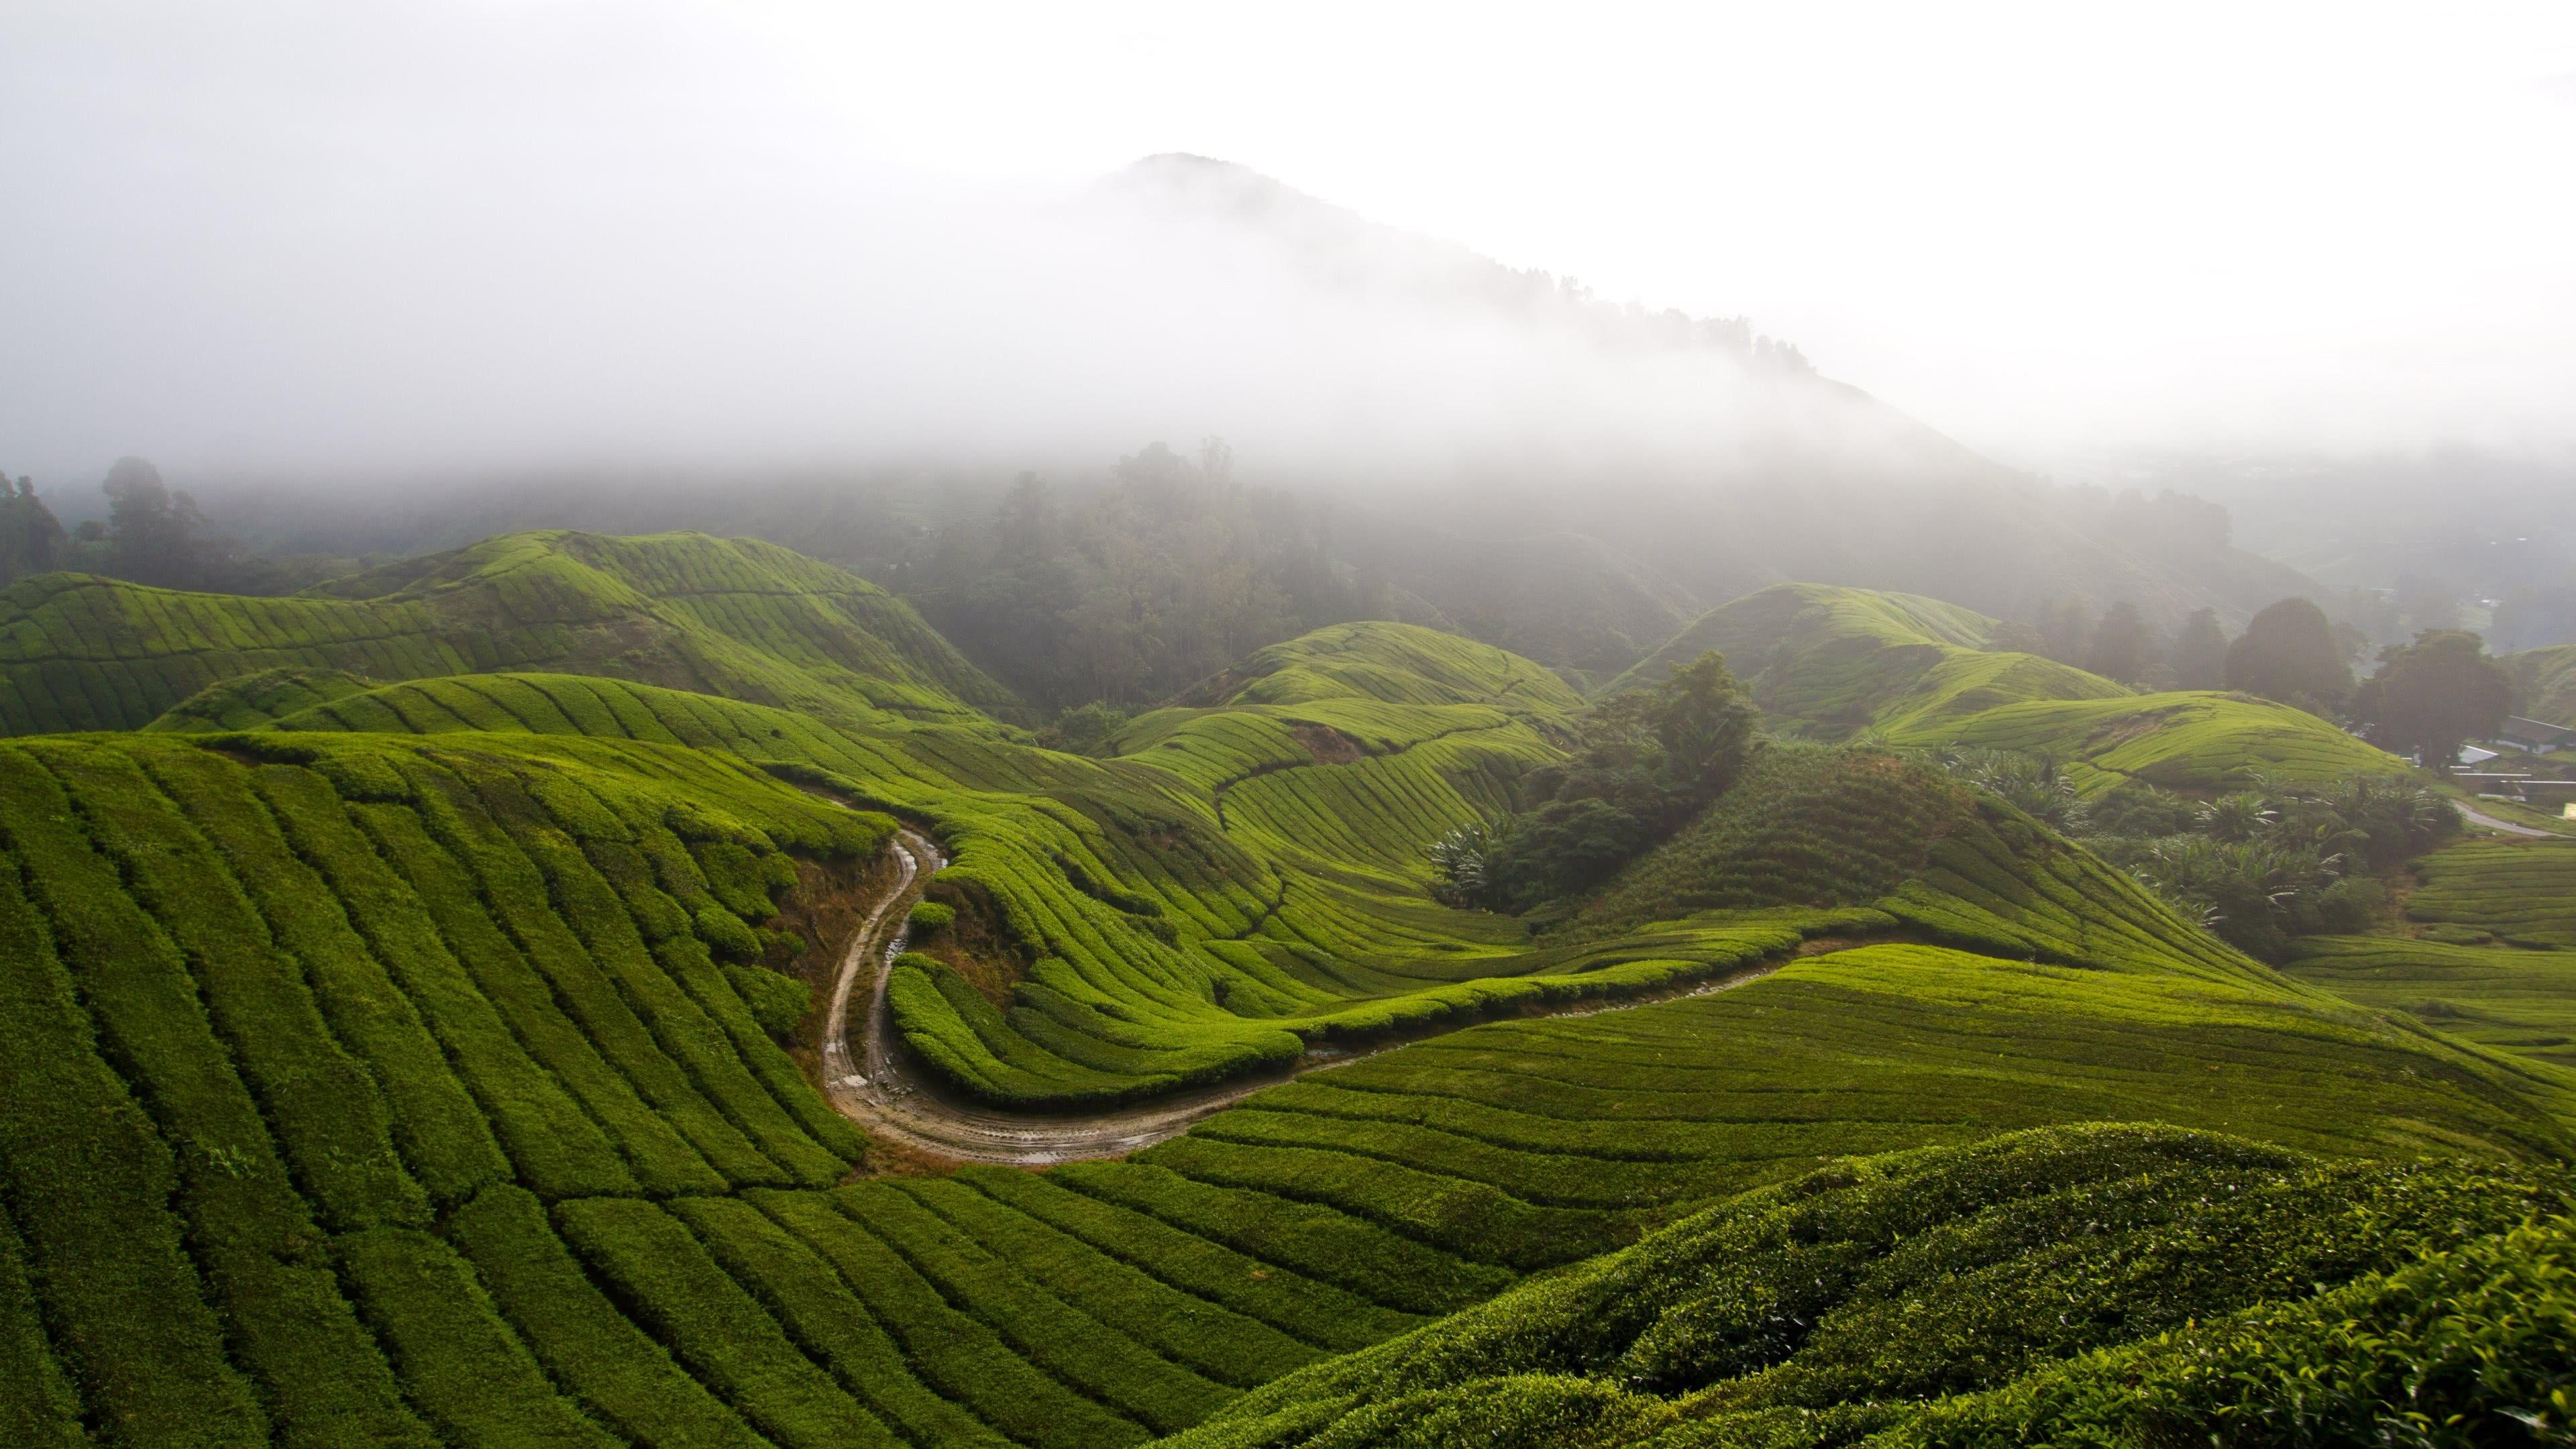 cameron highlands malaysia 4k wallpaper